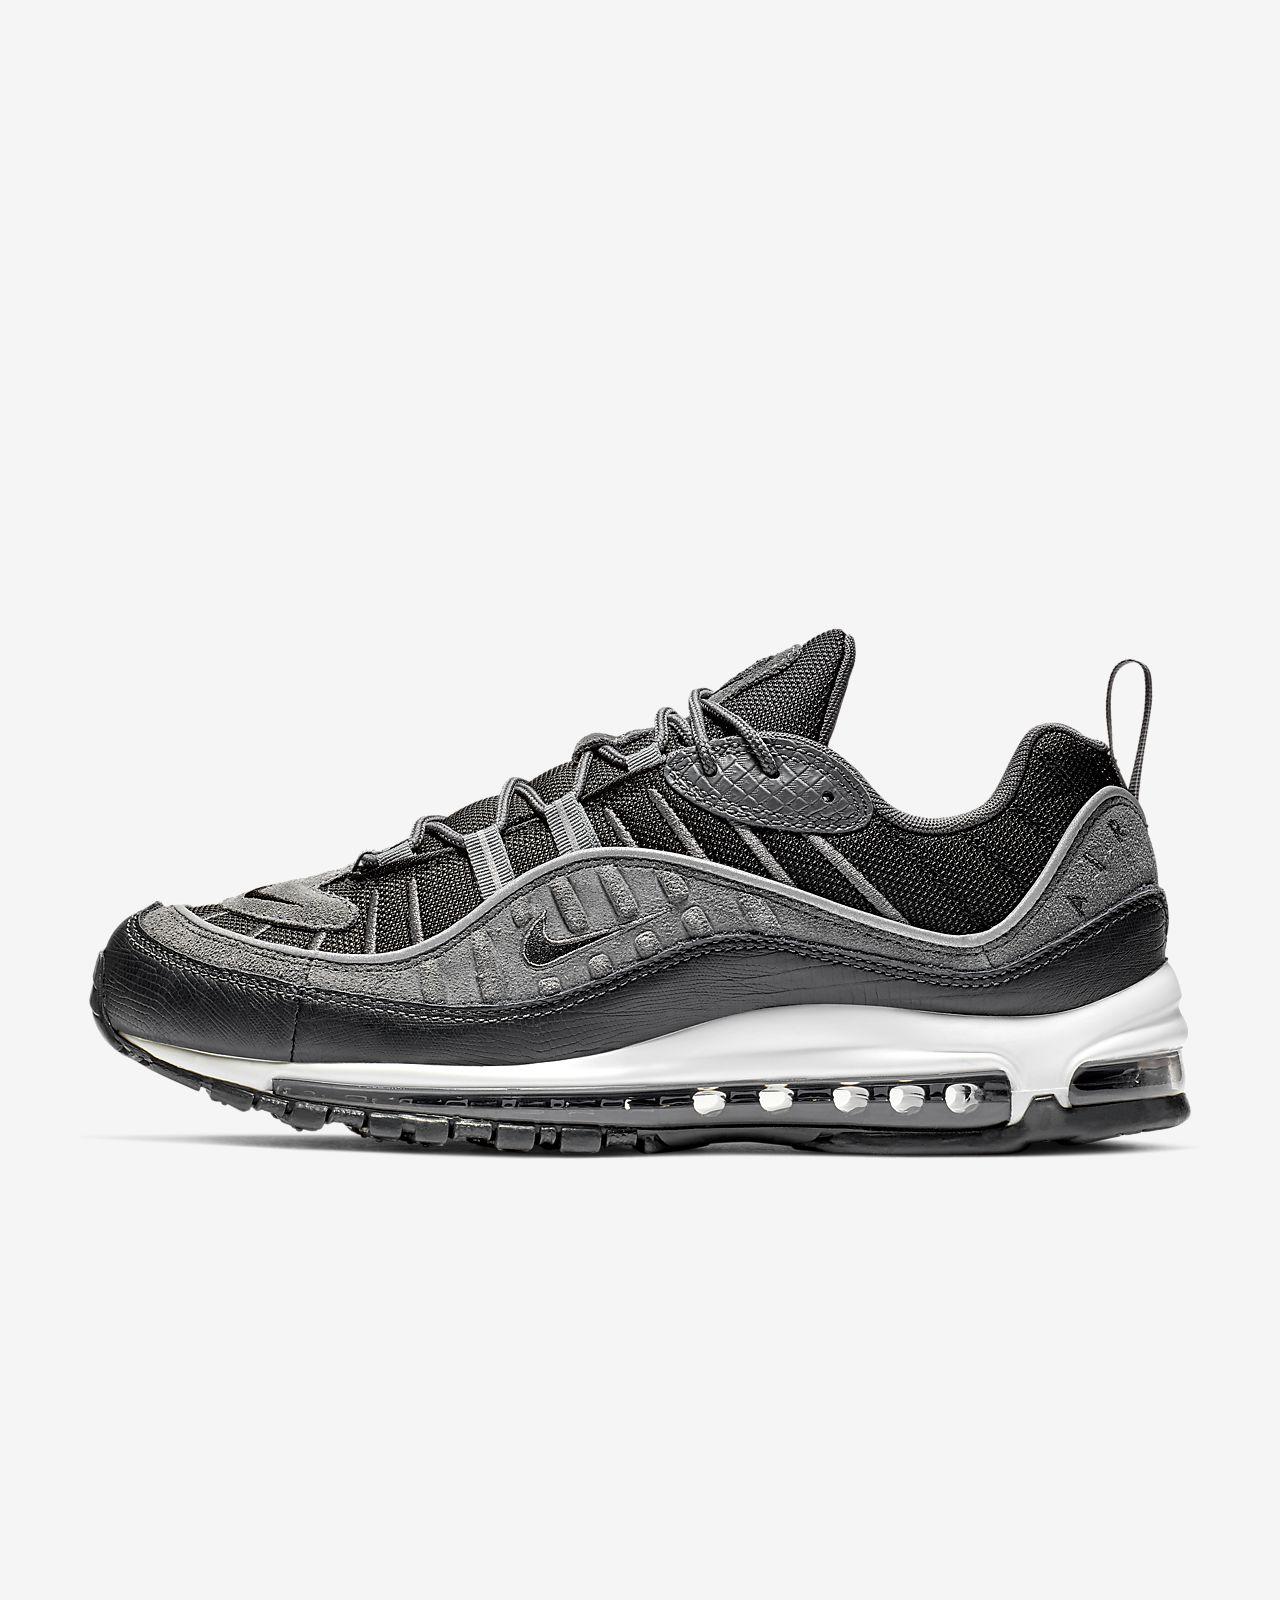 25cb725ce ... zapatos 59991 cde9b  france calzado para hombre nike air max 98 se  9136f 59a4a